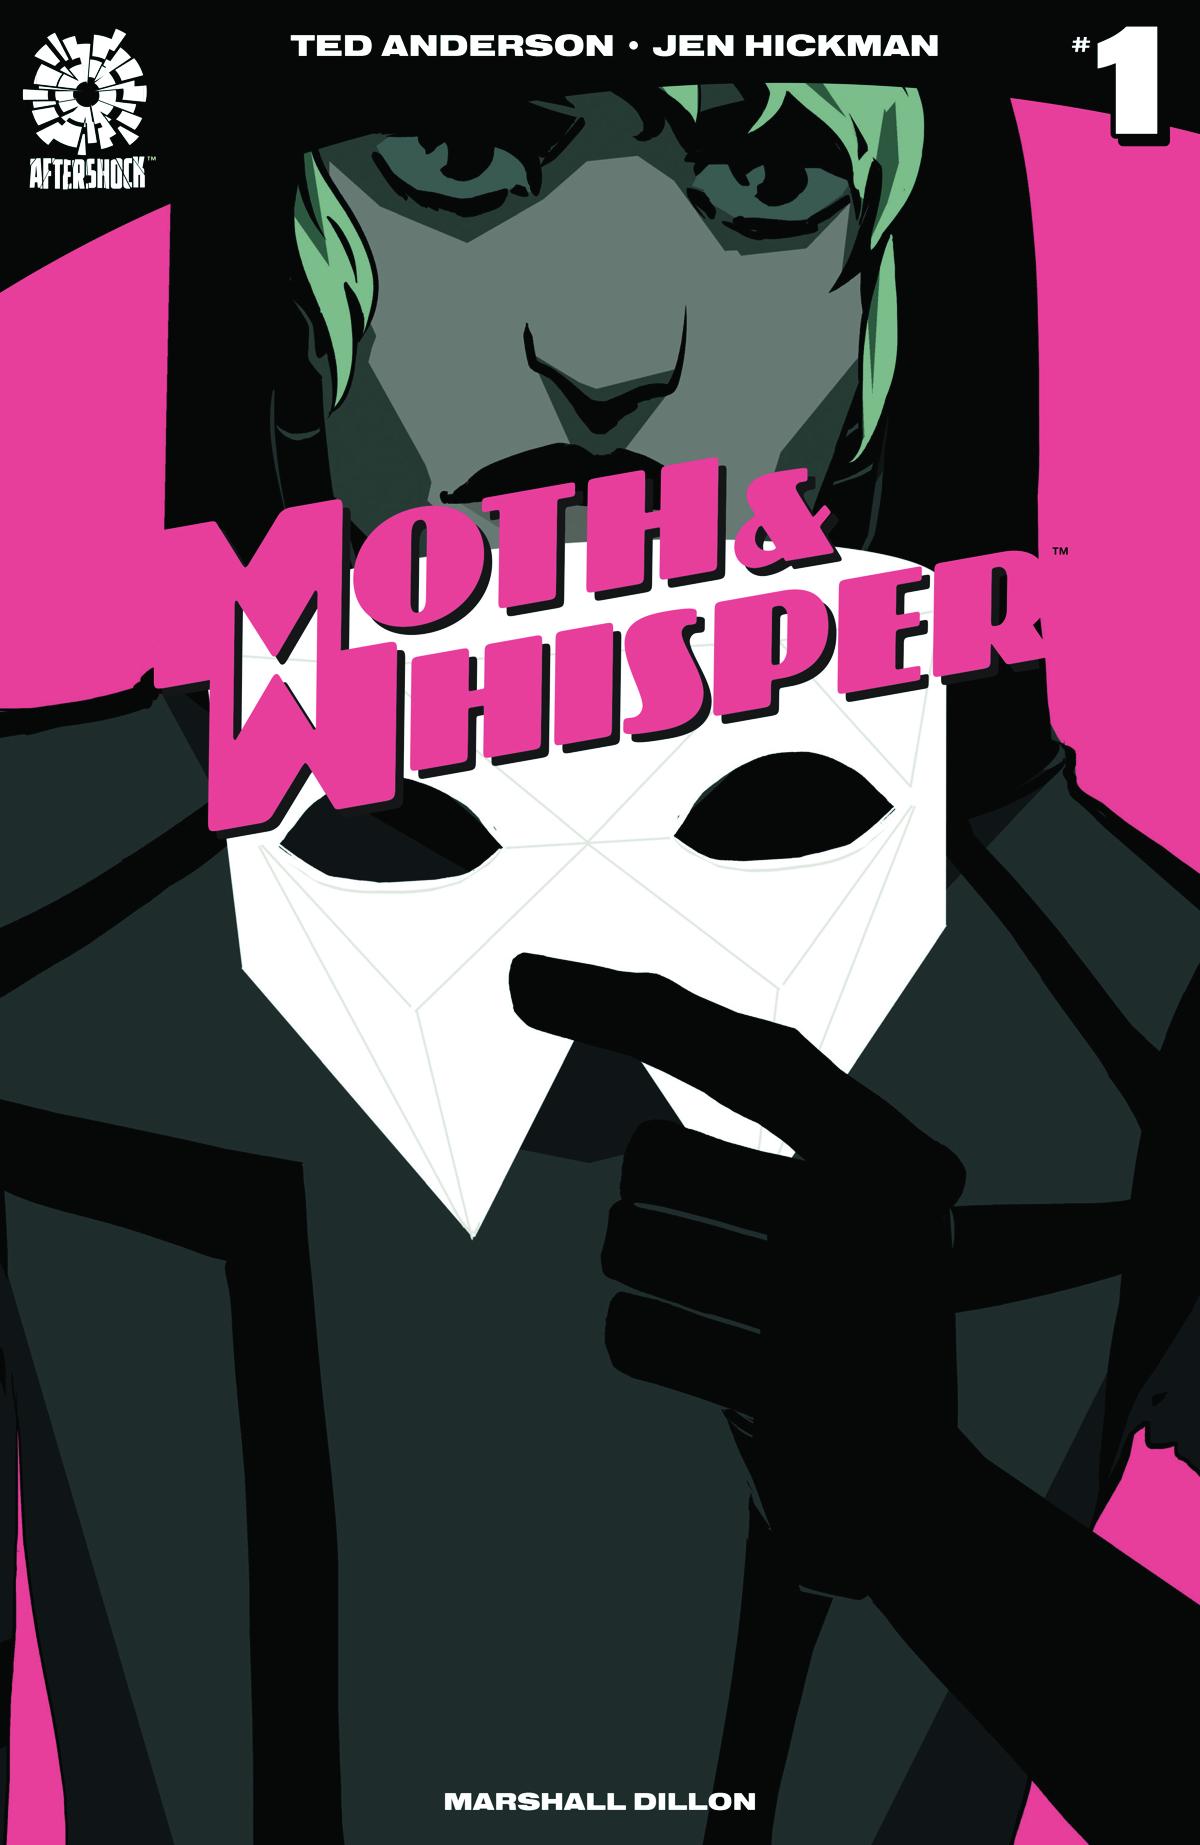 MOTH_AND_WHISPER_01_COVa_400dpi.jpg